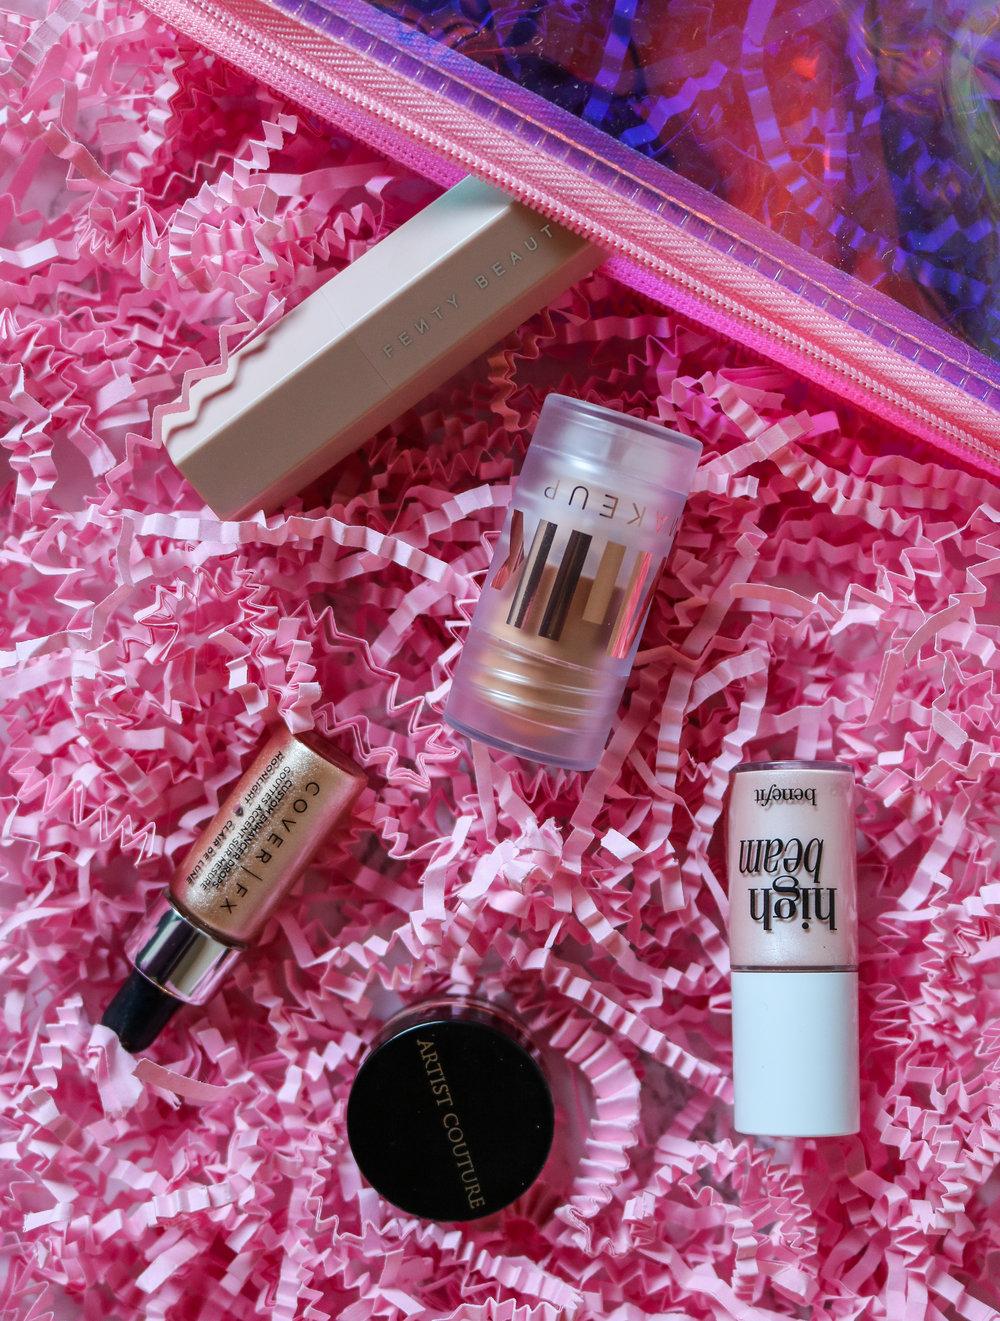 The Hungarian Brunette glow for it sephora favourites hihglighter set review - Milk makeup luminous blur stick, Fenty Beauty Match Stix, Benefit high beam, cover fx enhancer drops, artist couture diamond glow powder (2 of 3).jpg